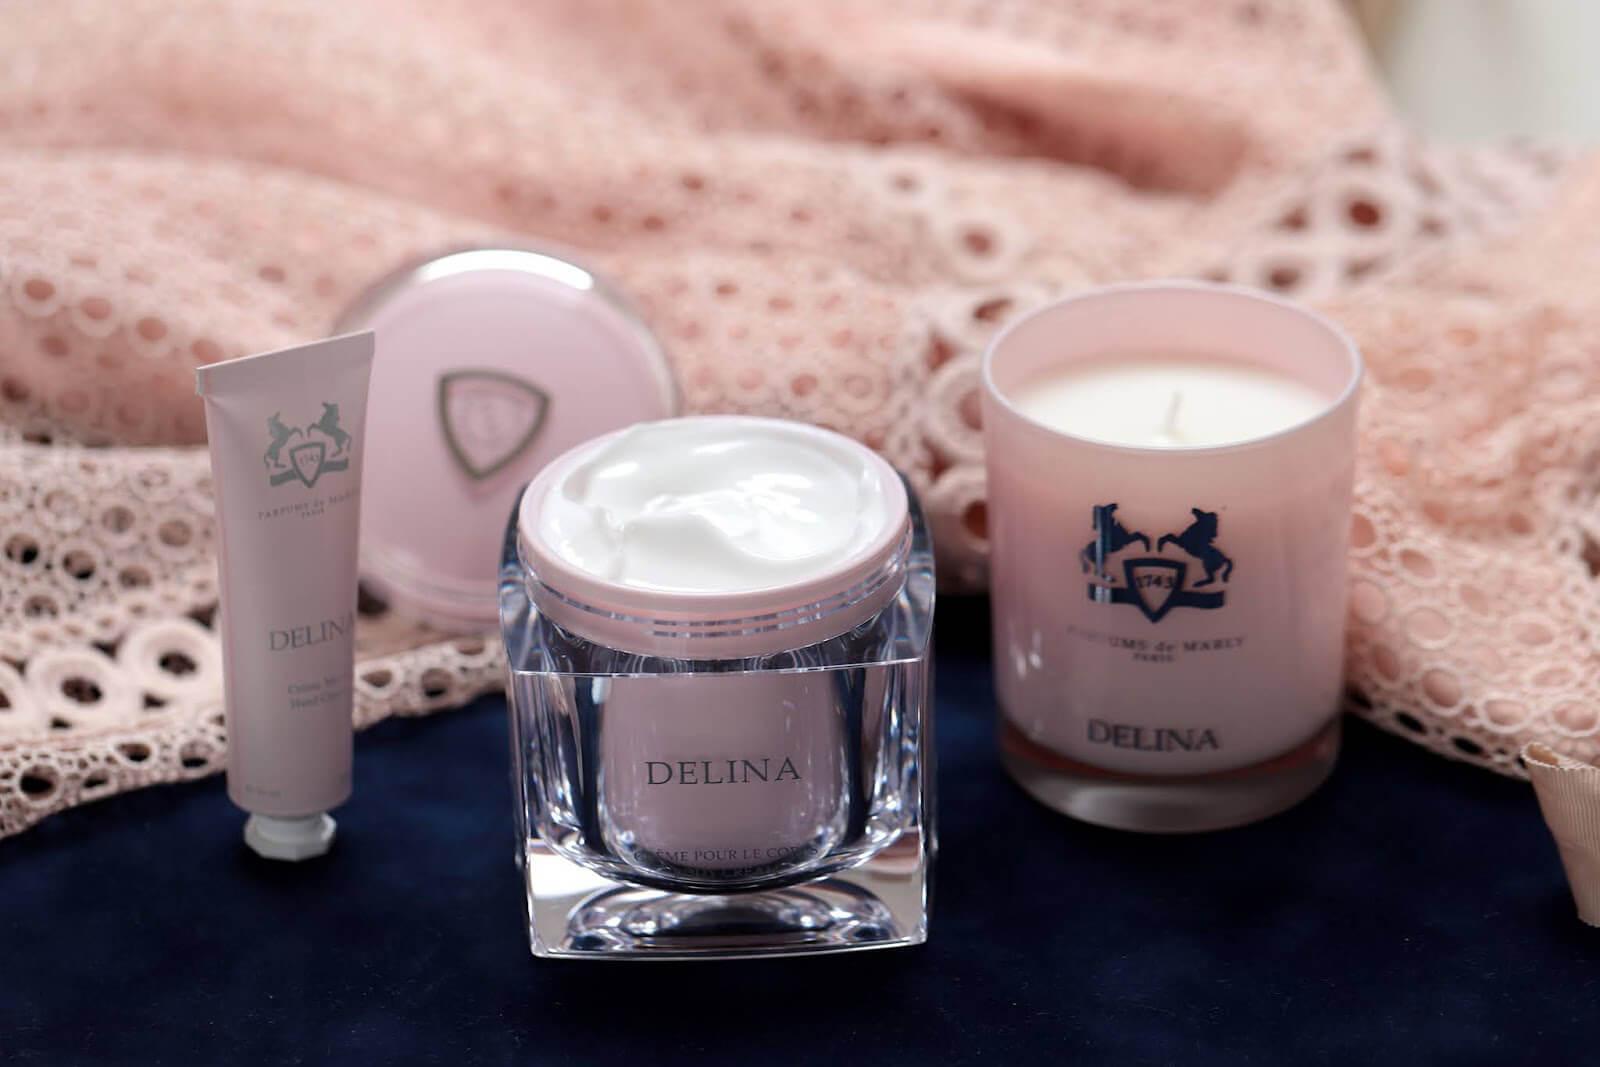 Delina Parfums de Marly Soins Corps Bougie avis